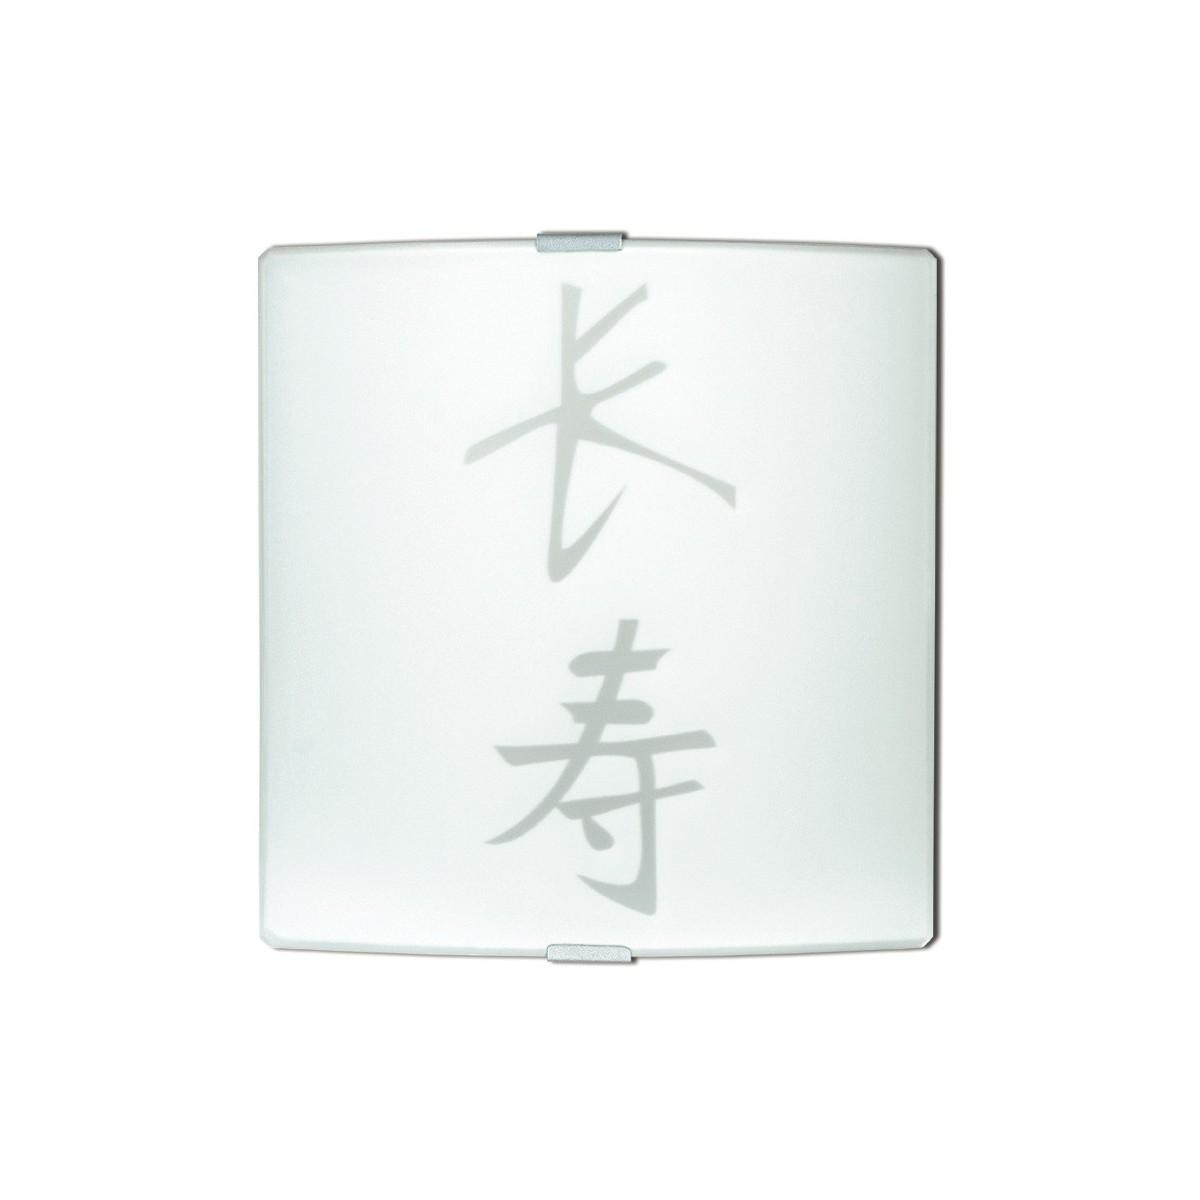 112/00112 - Applique Quadrata Vetro Bianco Simboli Cinesi interno Moderno E27